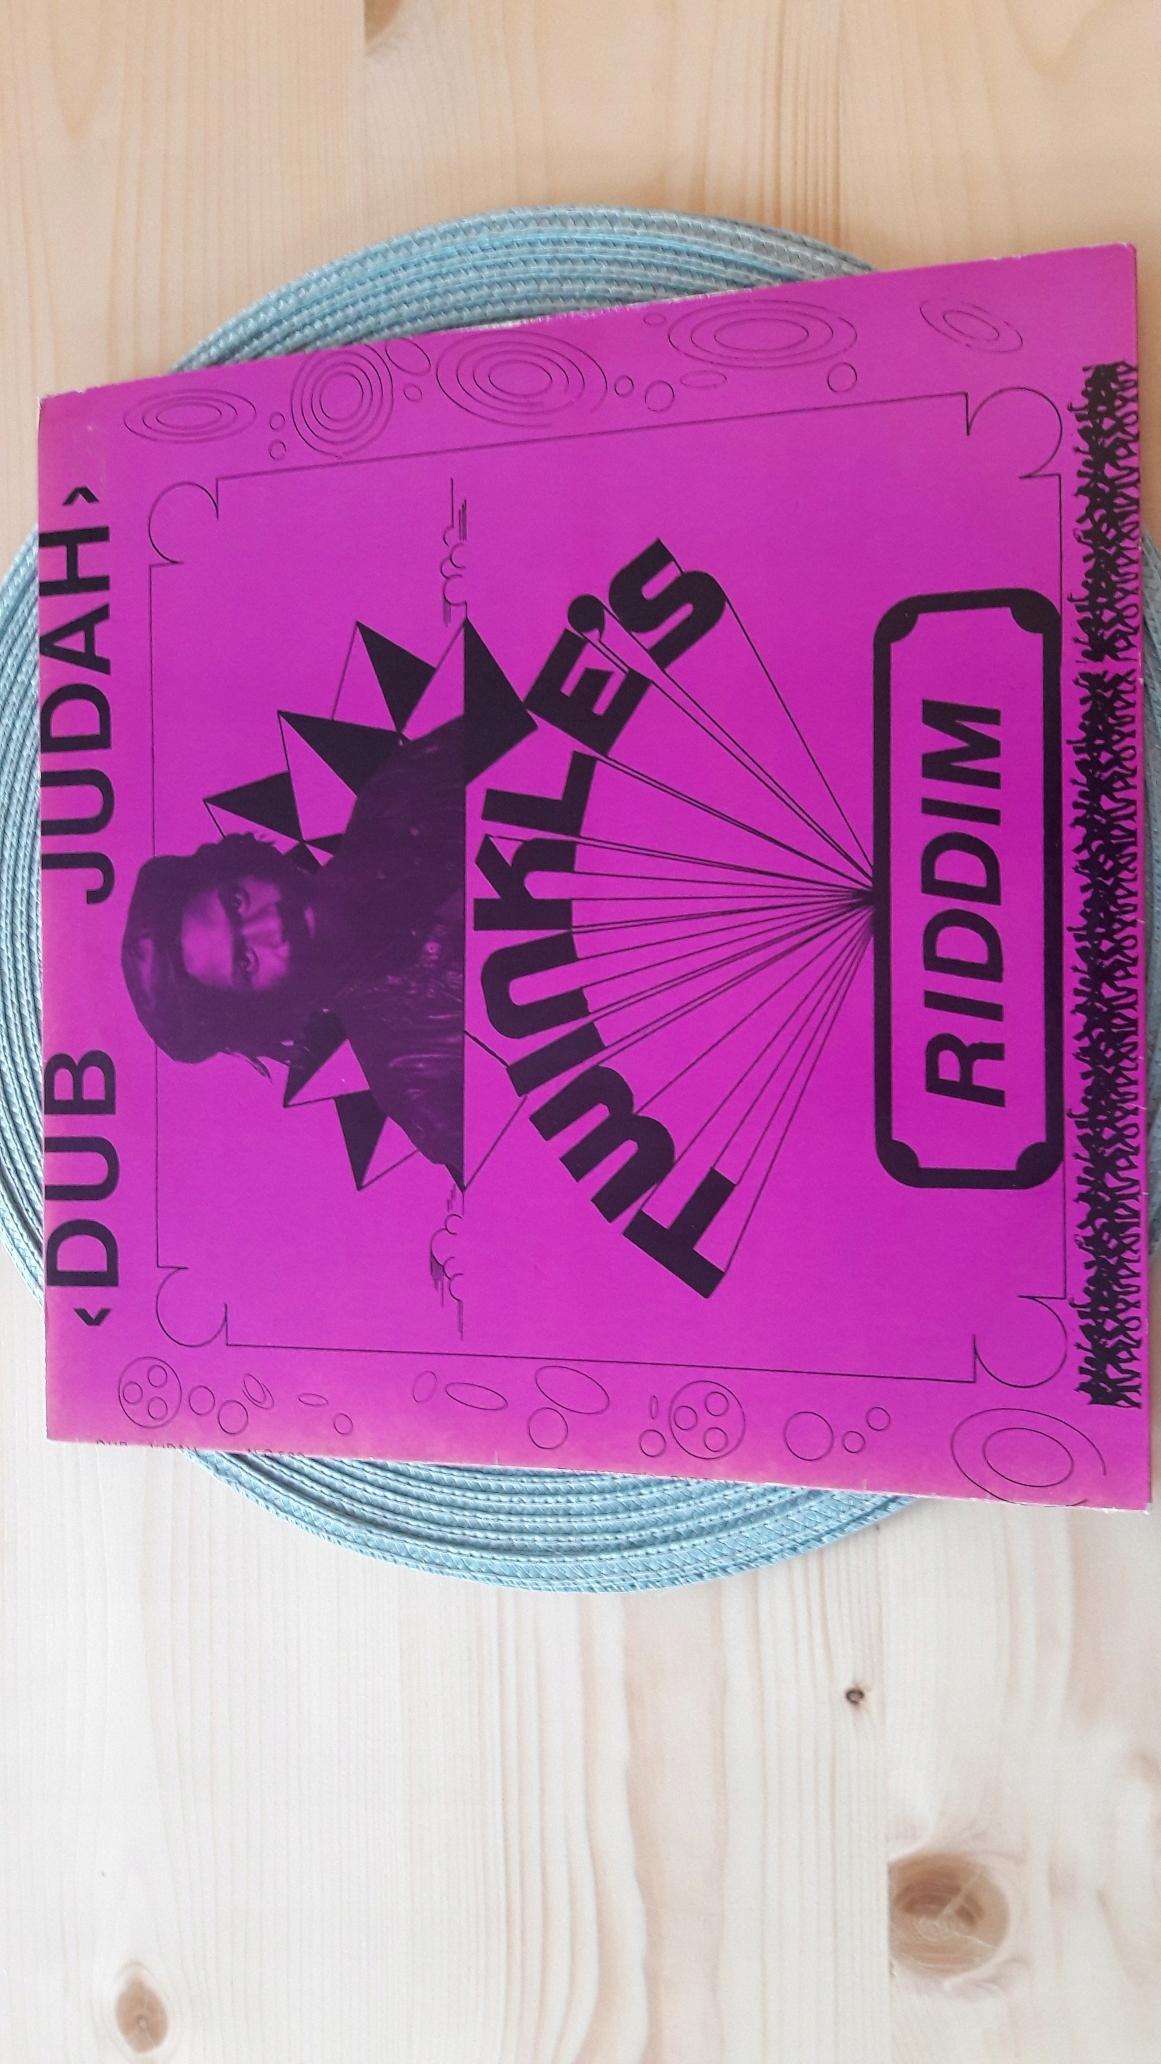 "MegaRare! DUB JUDAH - TWINKLE""S RIDDIM LP1992"